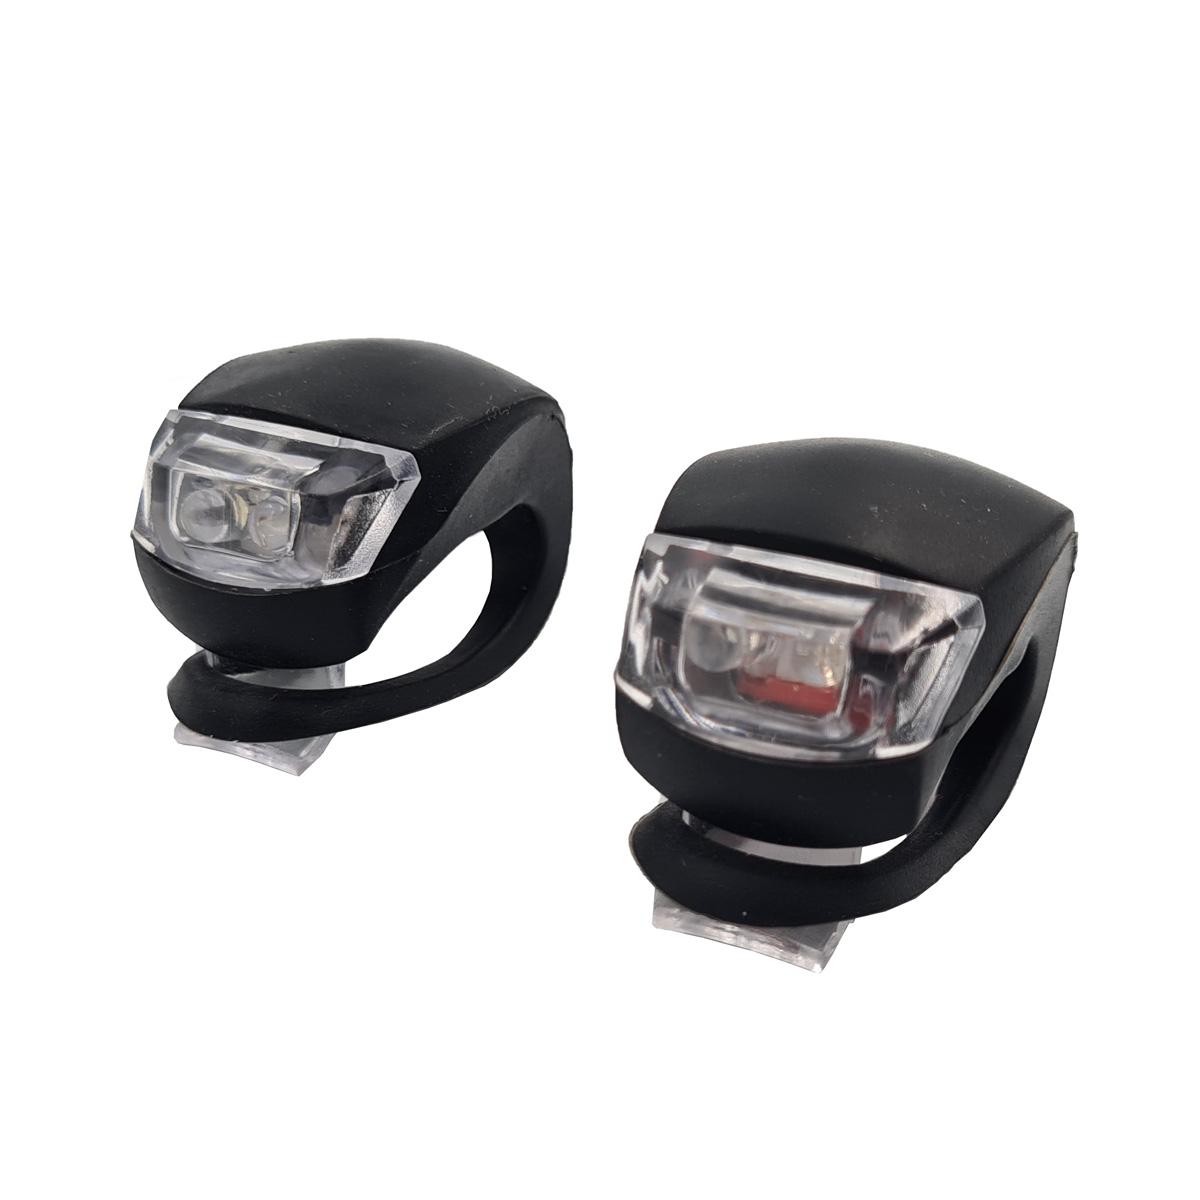 Kit 2 Farol lanterna LEDs Dianteiro e Traseiro lanterna para Bicicleta HJ008-2 LifetimeLED